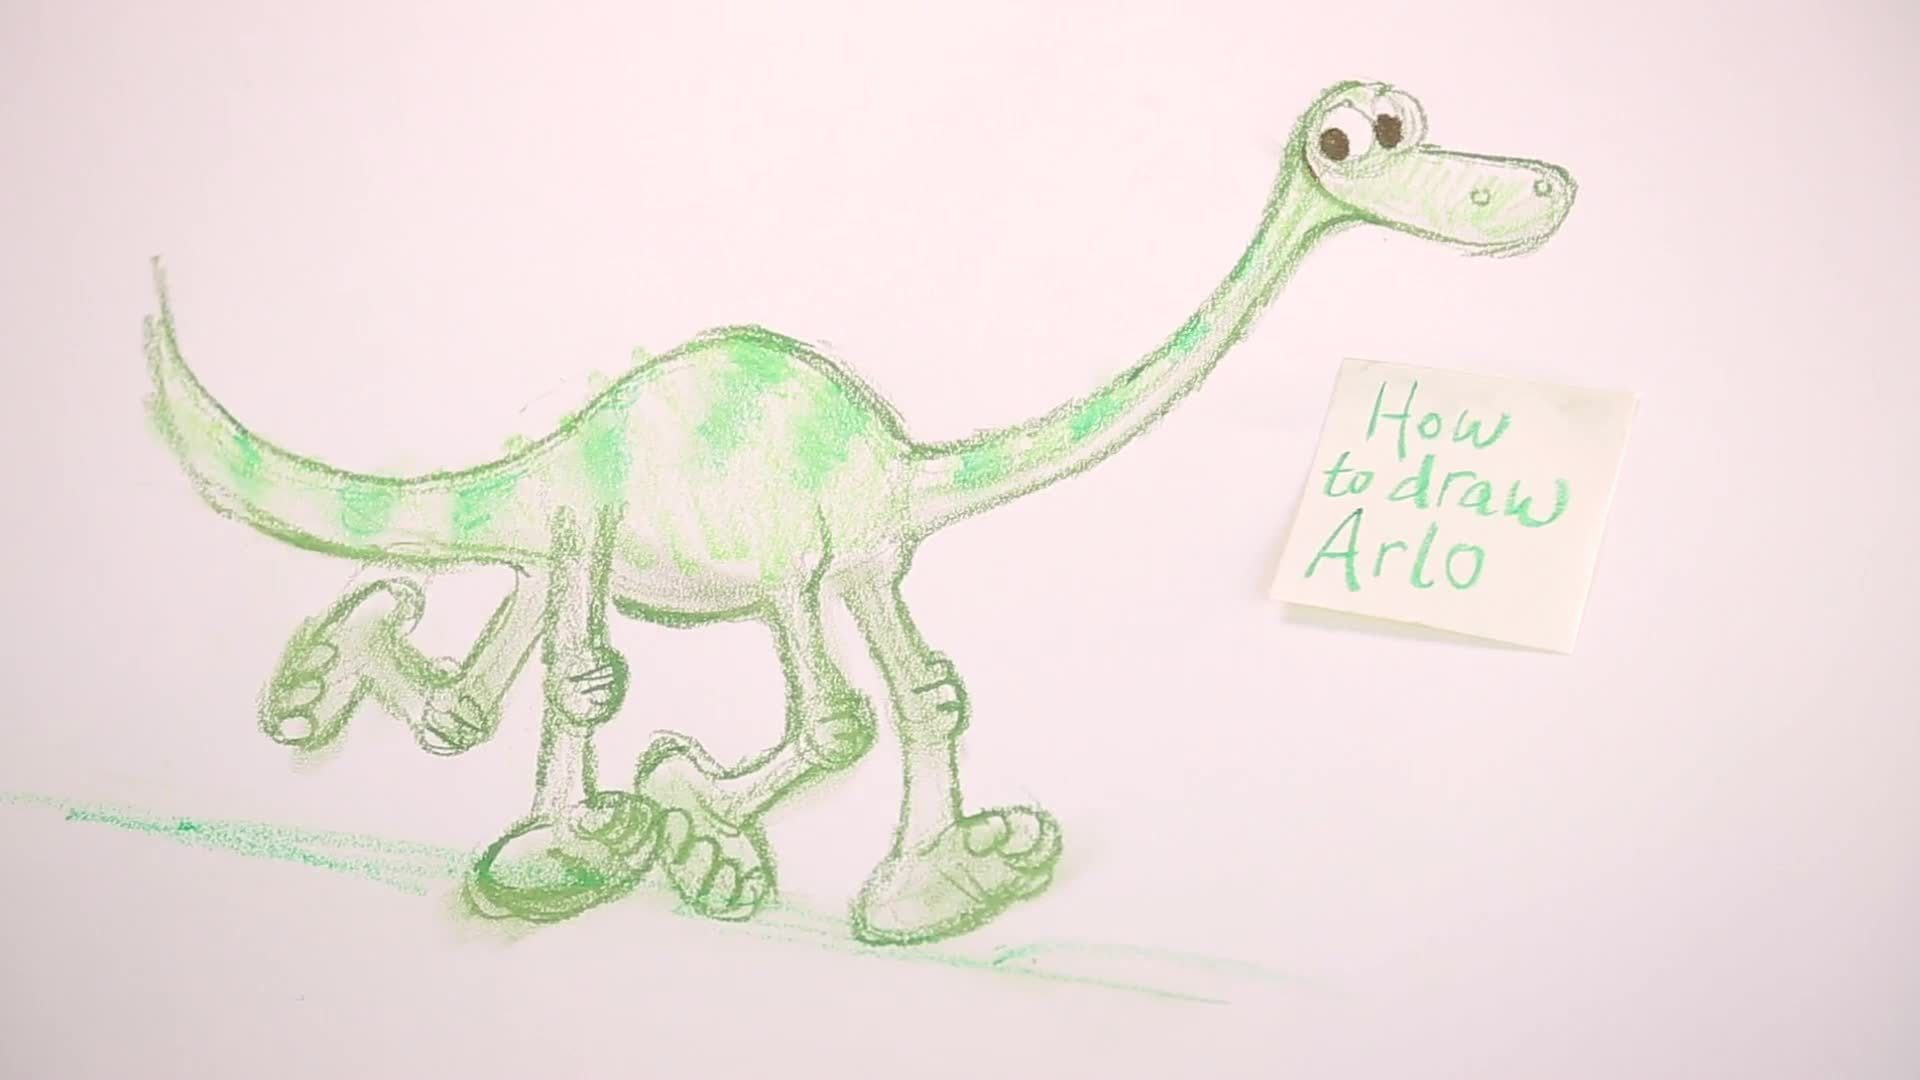 How to Draw Arlo from Good Dinosaur | Disney Insider